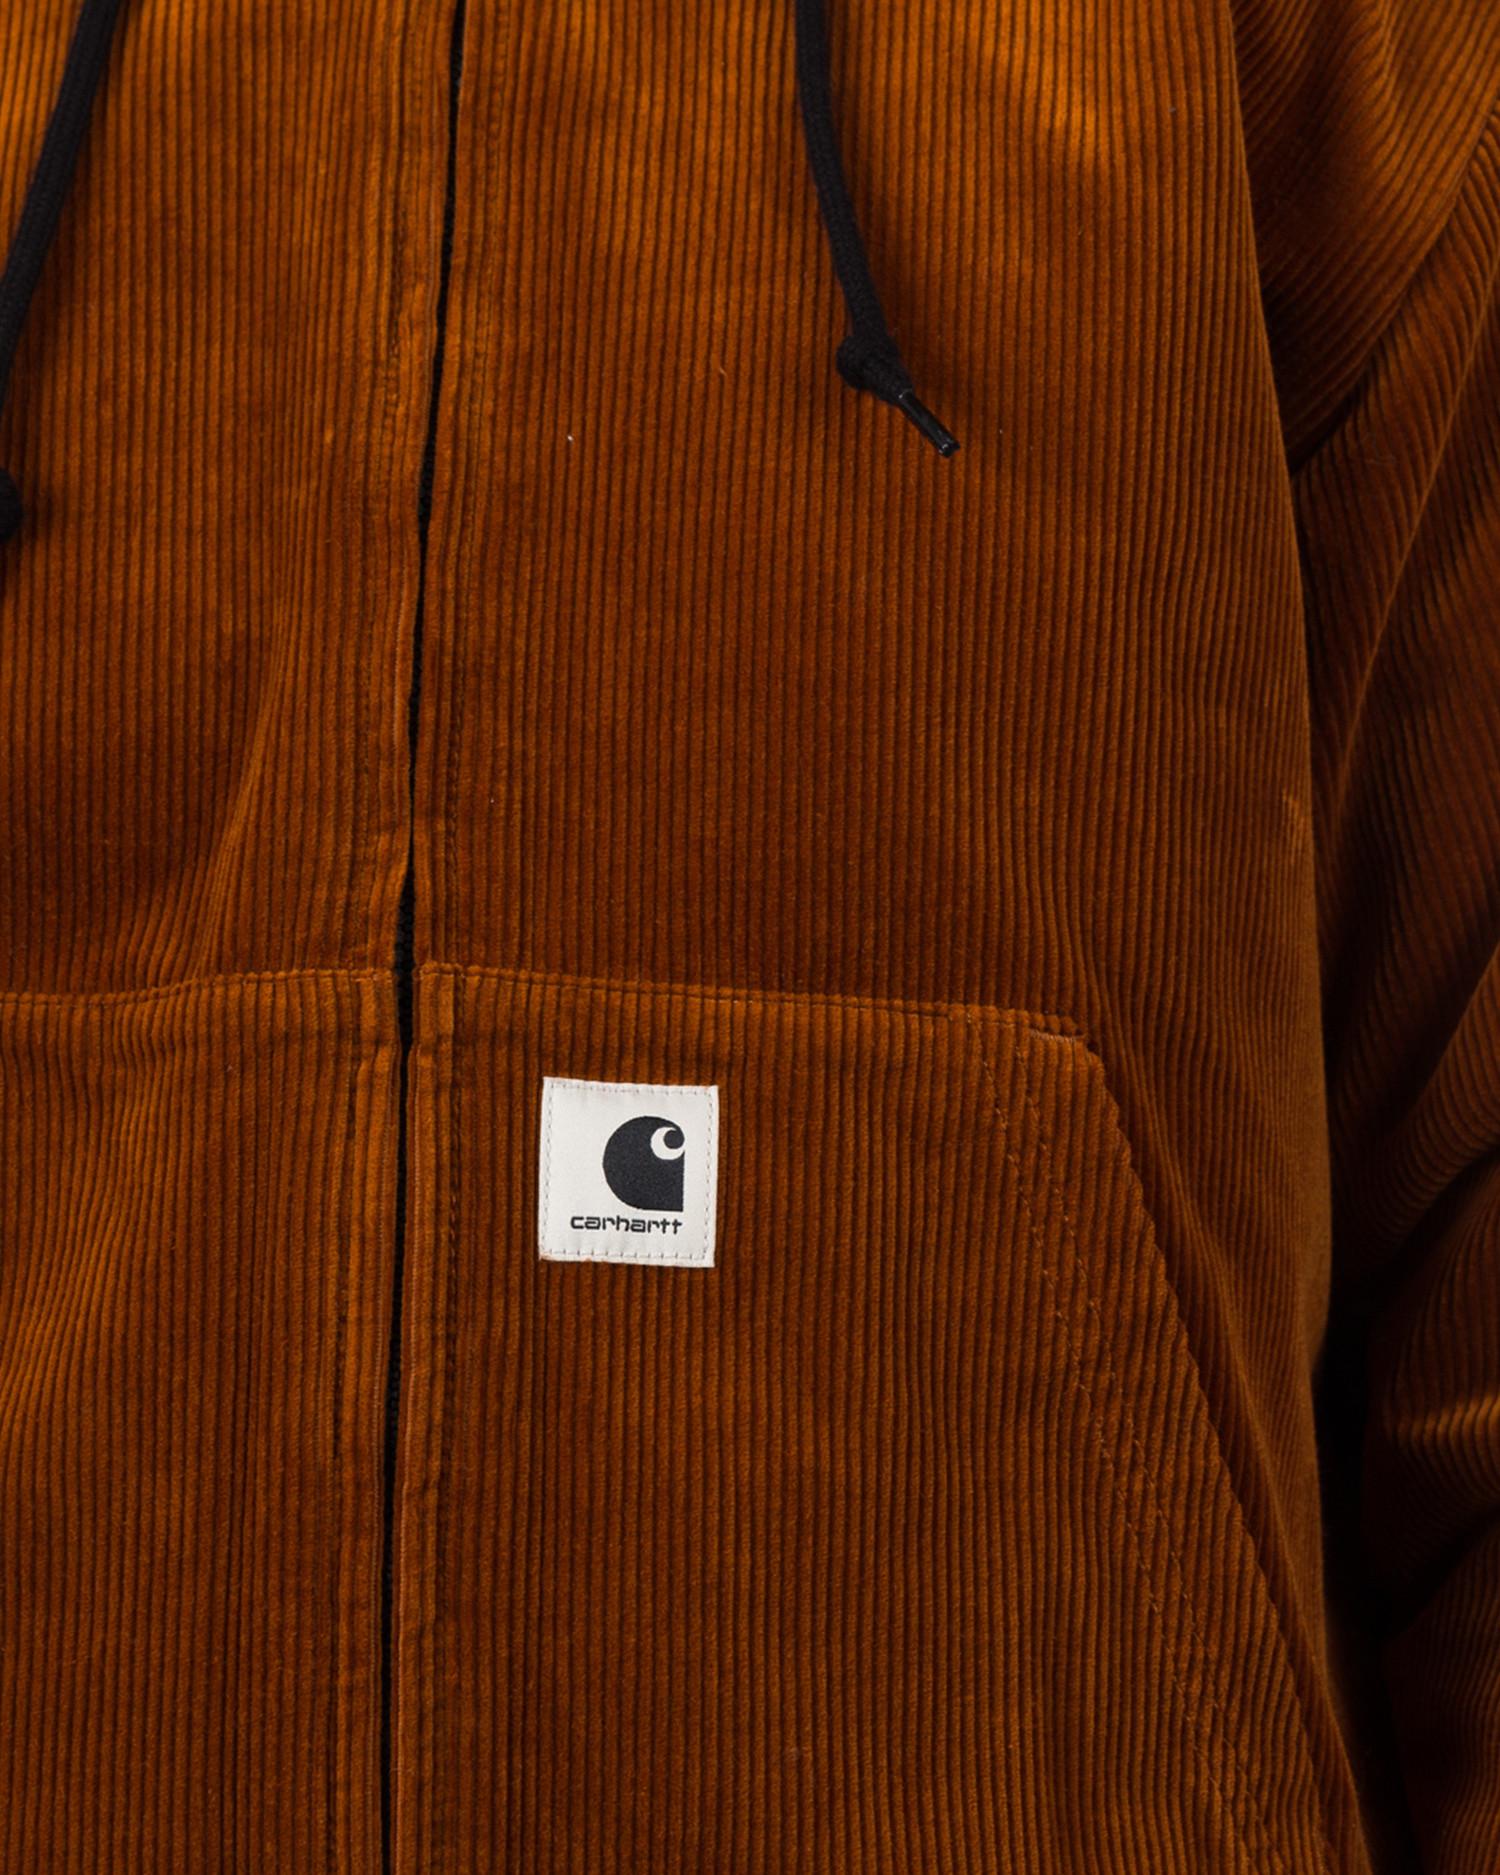 Carhartt Women's Timber Jacket Brandy Rinsed